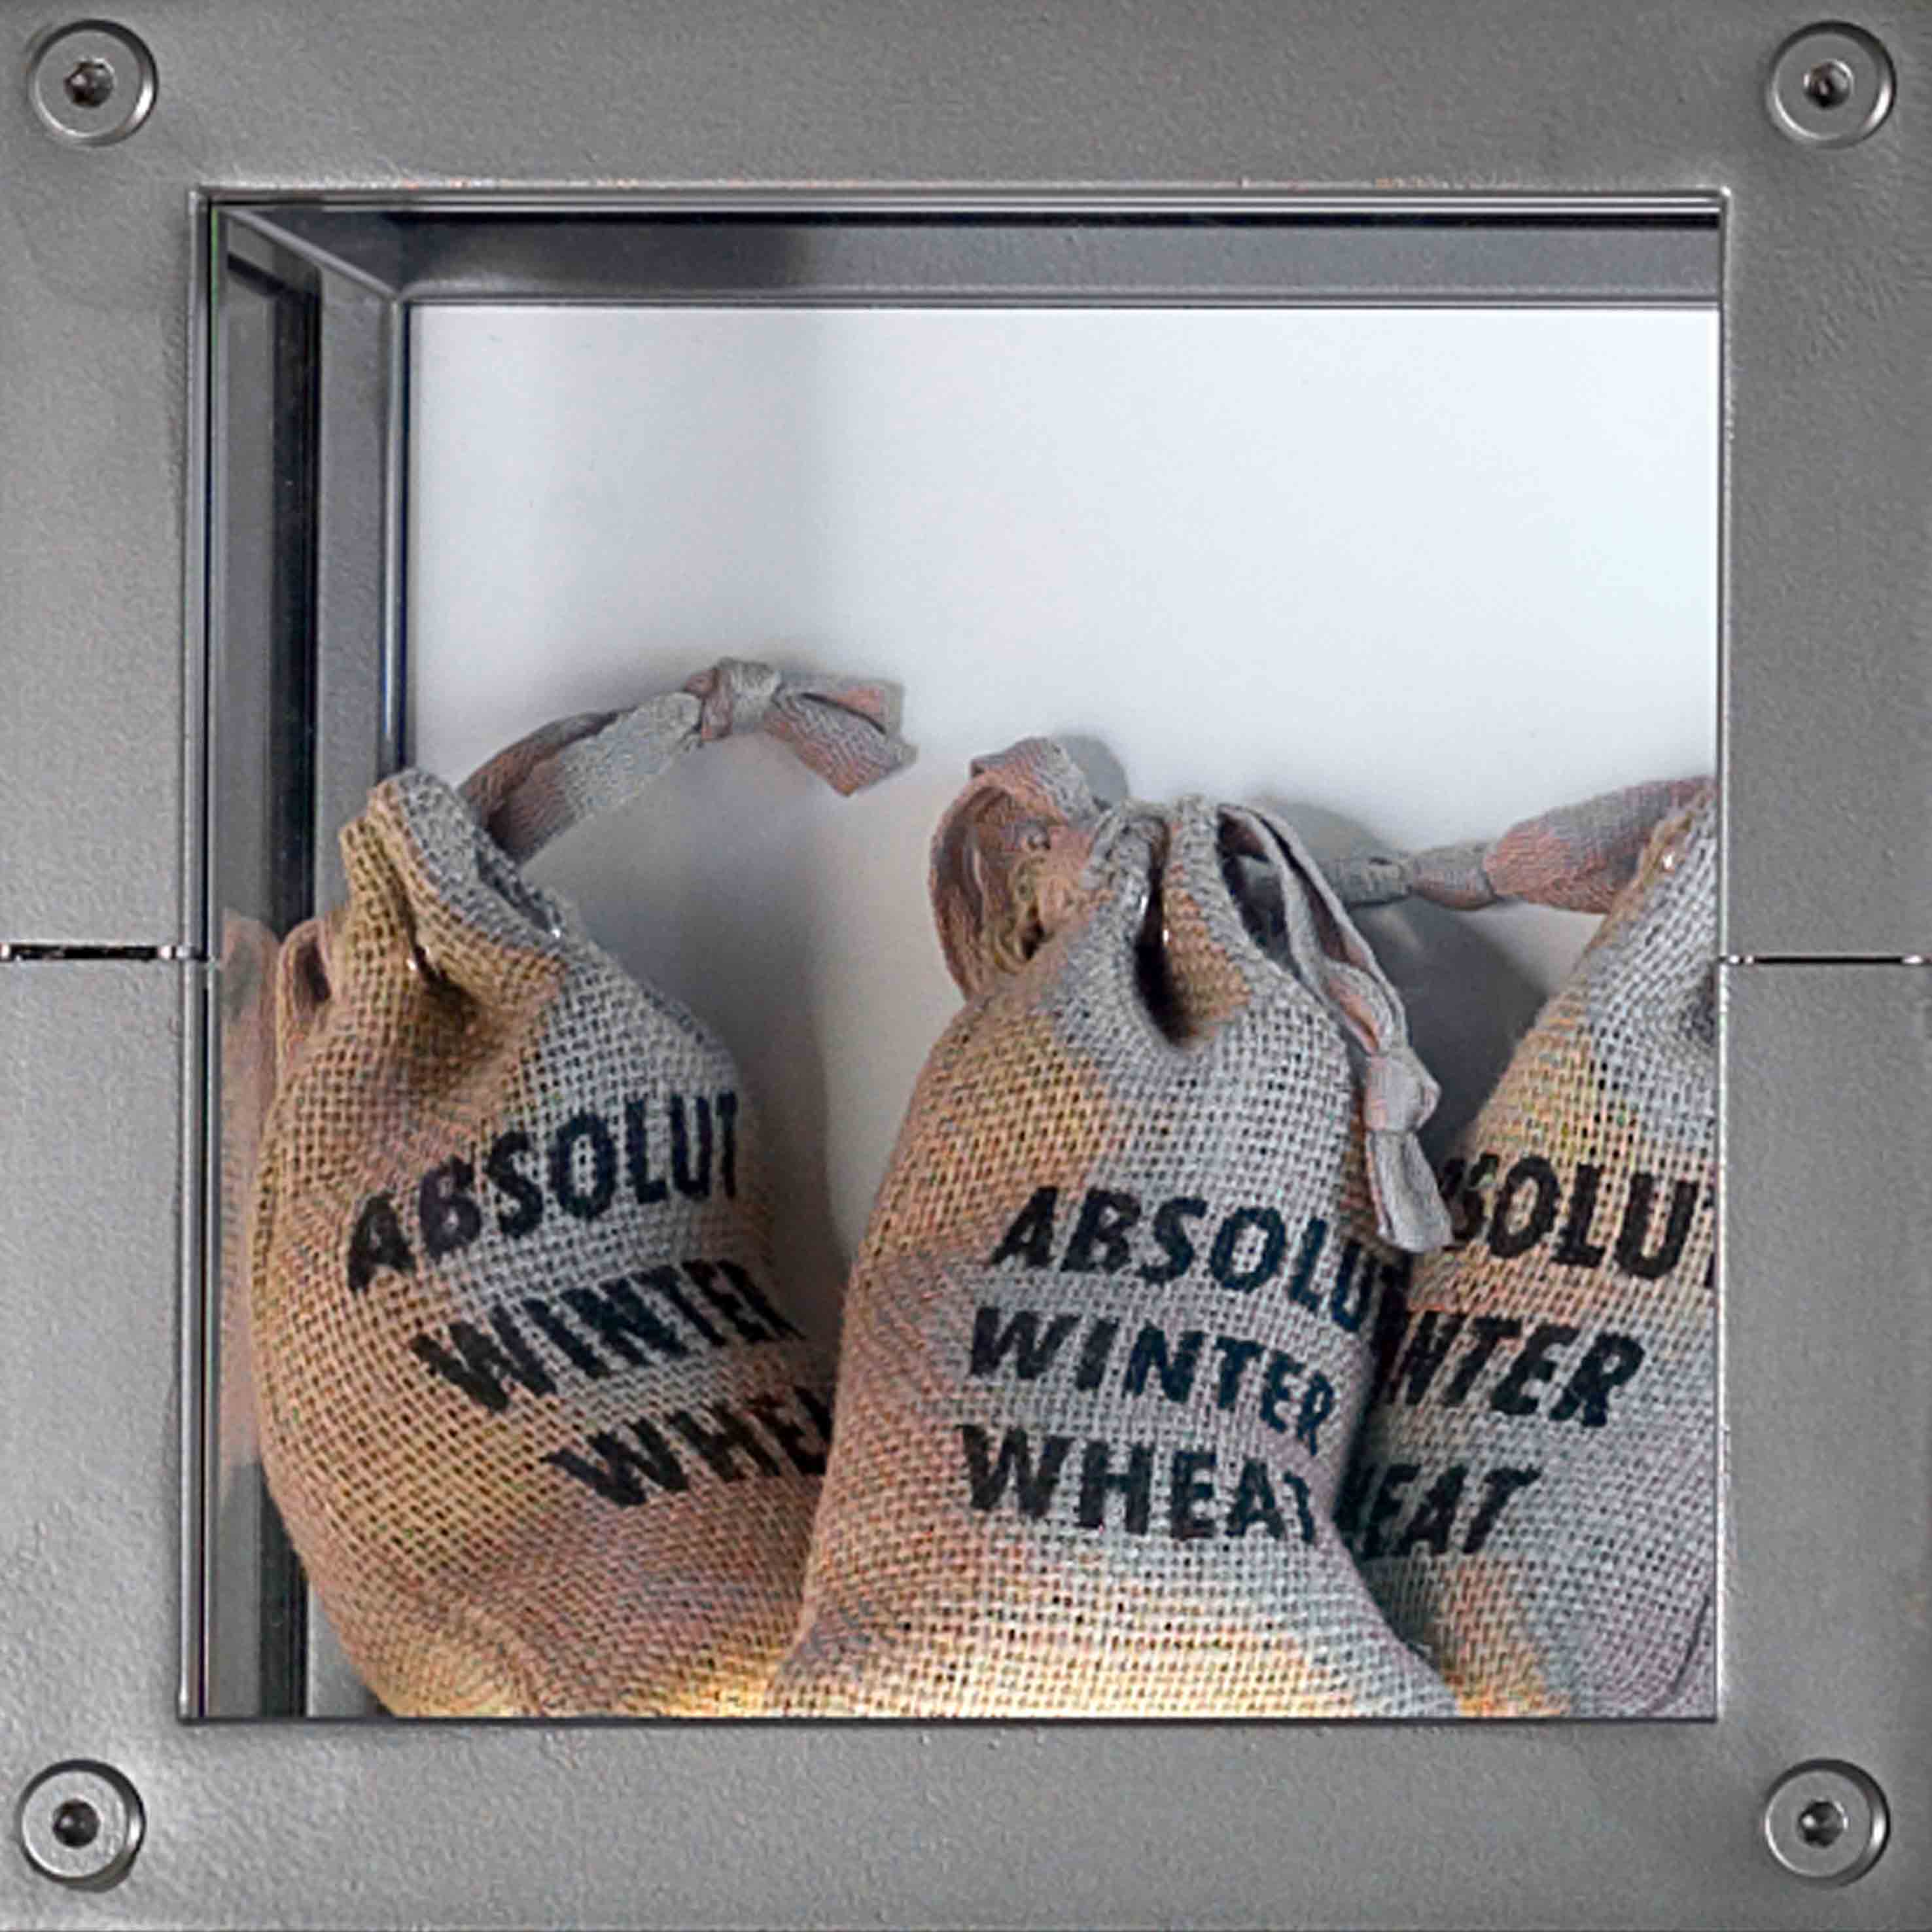 AVO_Glorifier wheat bag